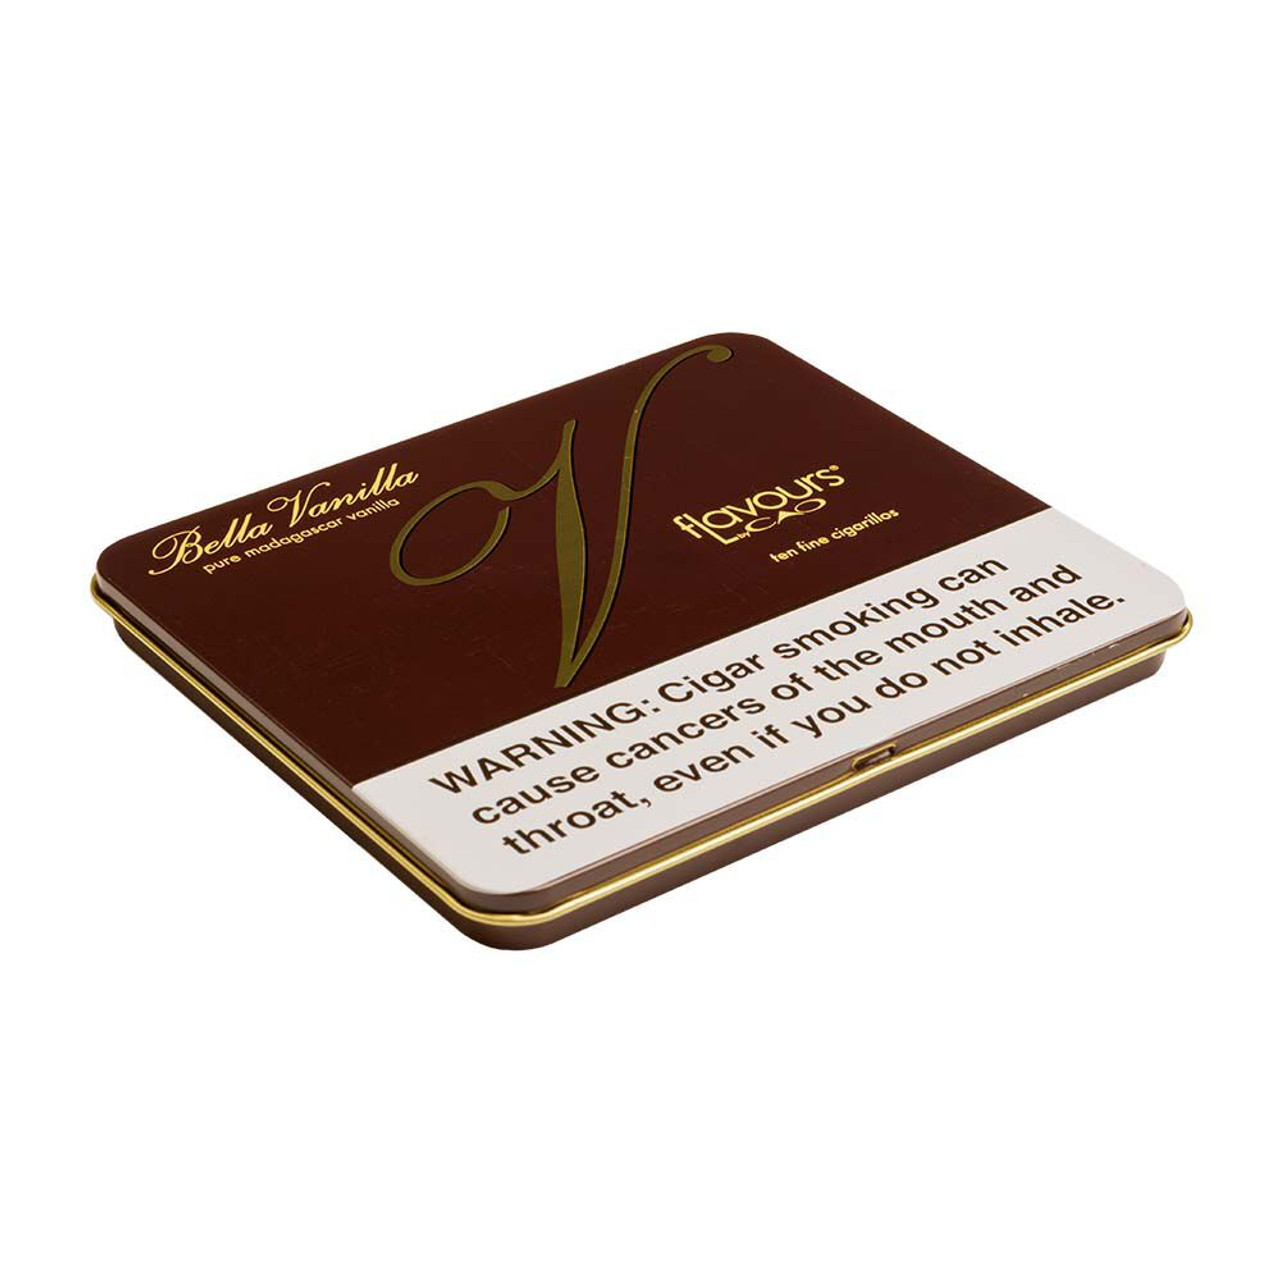 CAO Flavours Bella Vanilla Cigarillos Cigars - 4.0 x 30 (5 Tins of 10 (50 total))